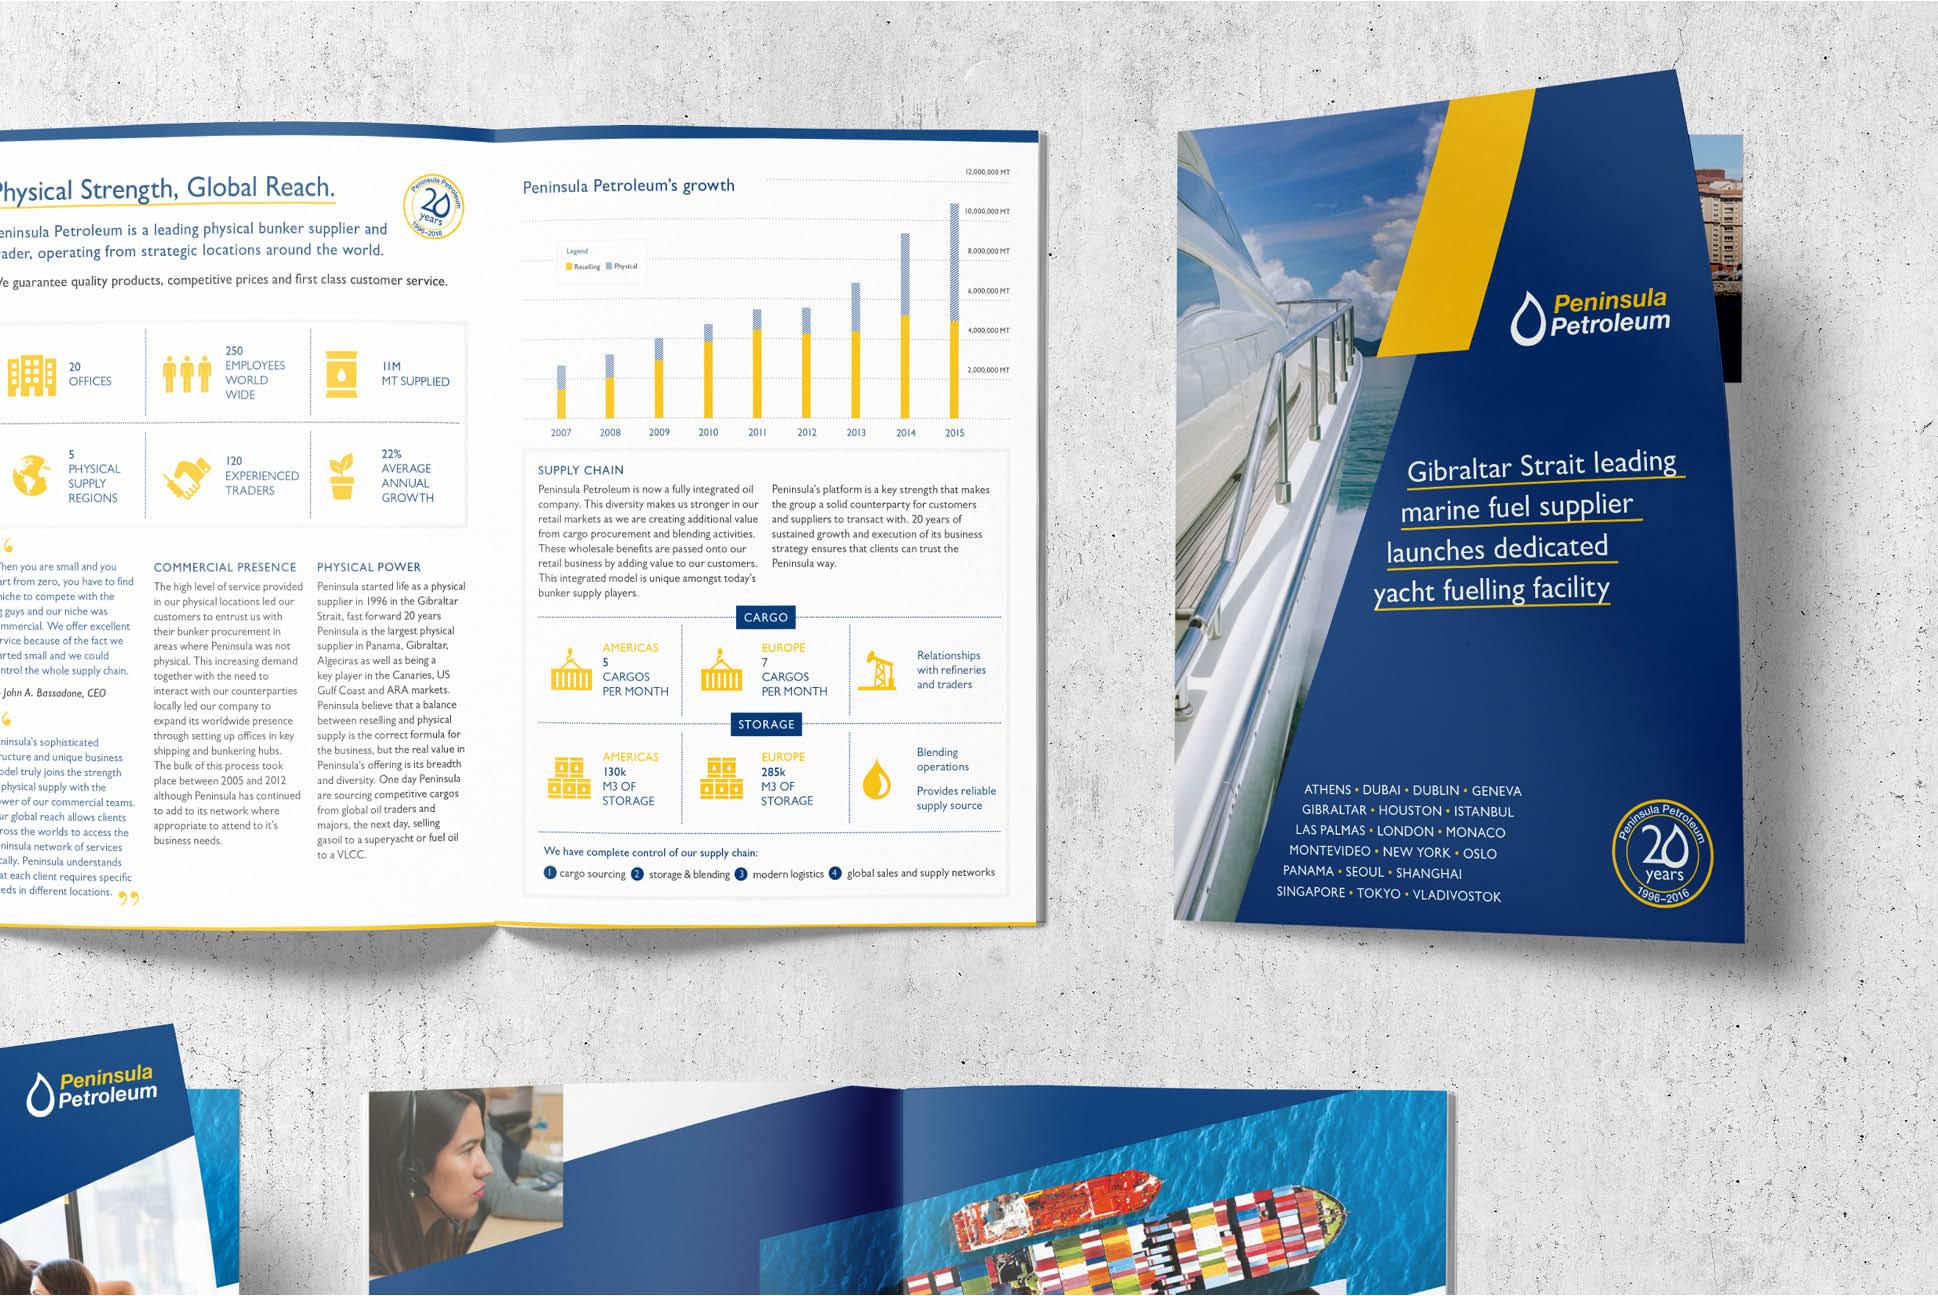 Peninsula Petroleum flyers | Branding and Marketing Services - Independent Marketing | IM London